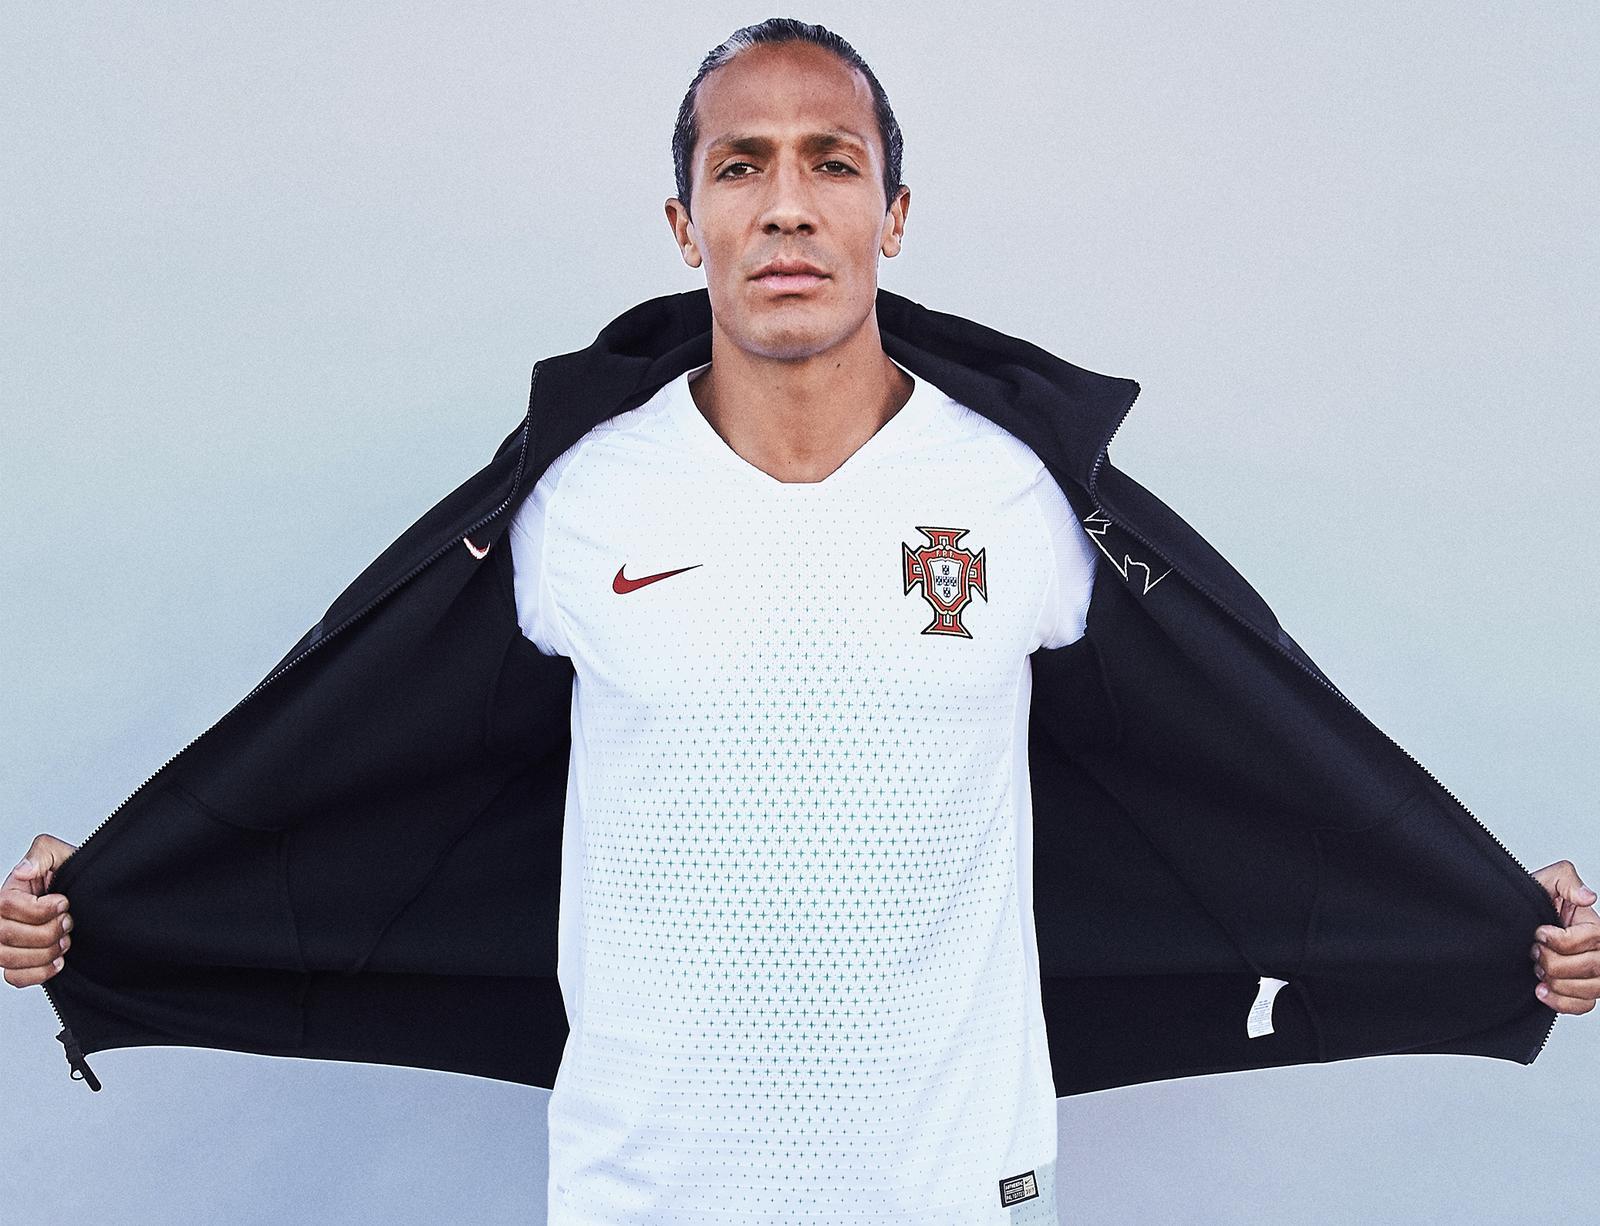 World Cup 2018 Team Uniforms